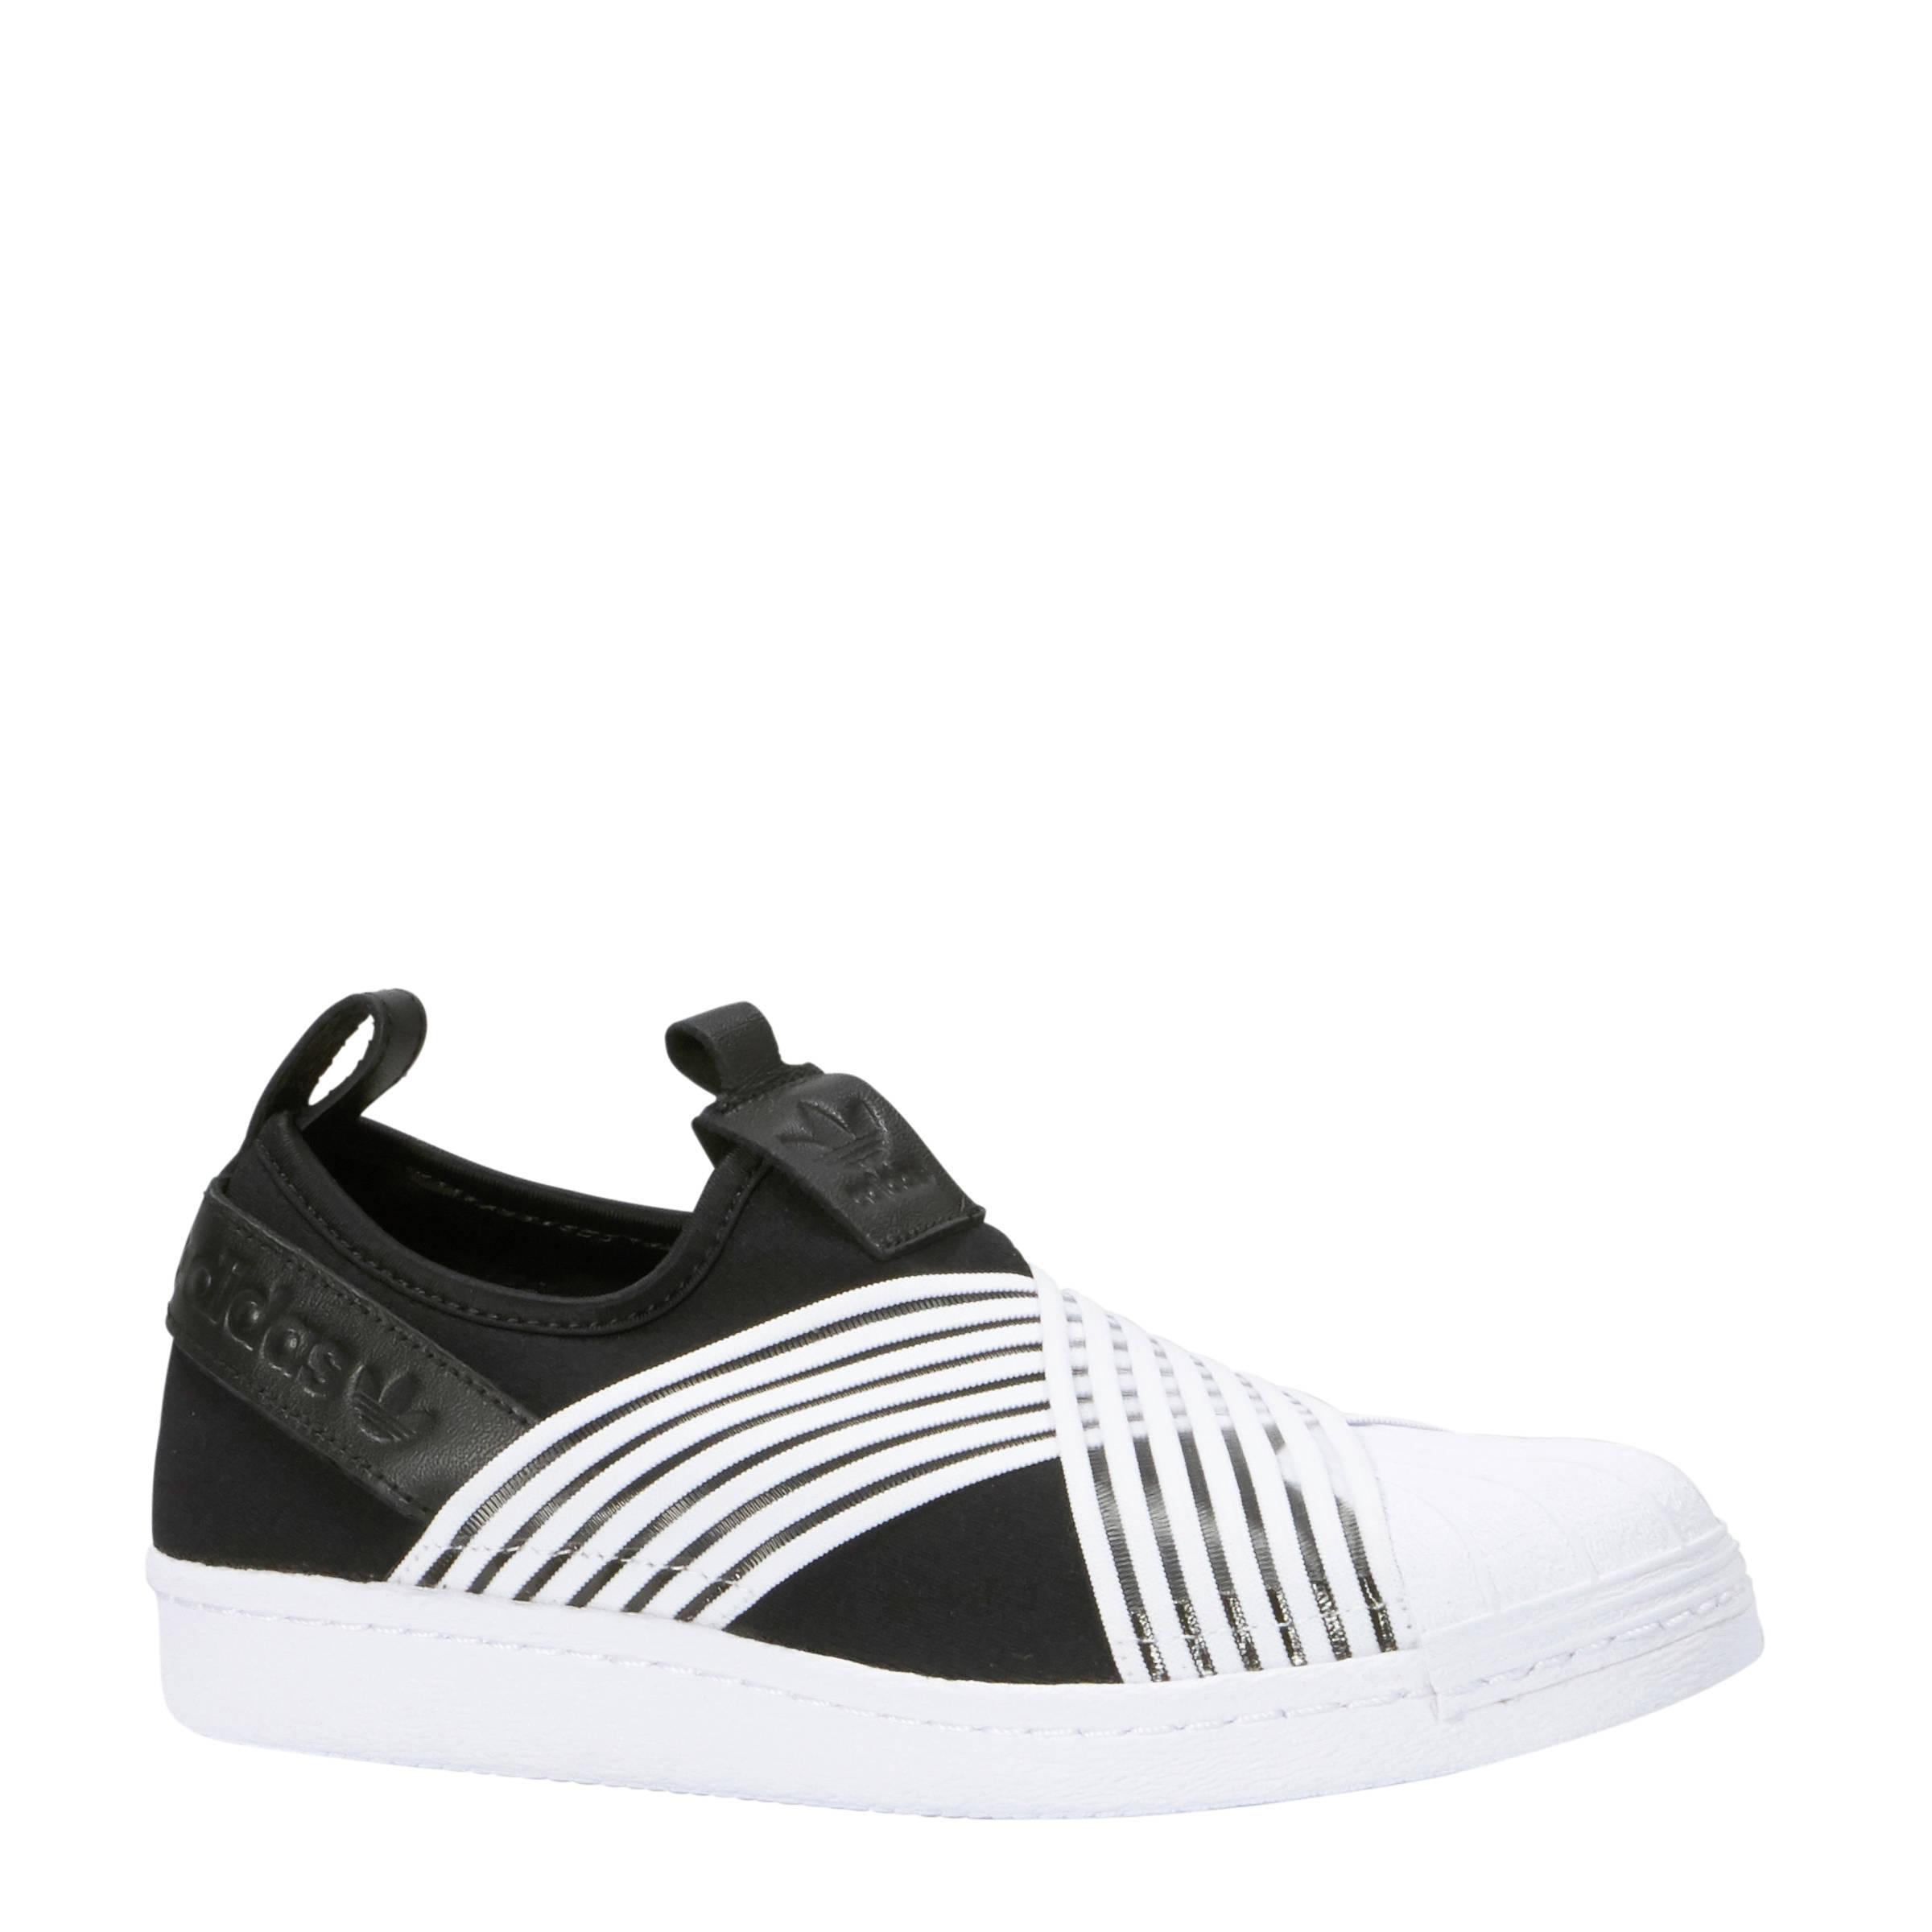 size 40 5dcf9 b354b Wehkamp Originals Superstar Adidas Slip On Wfn4nIq